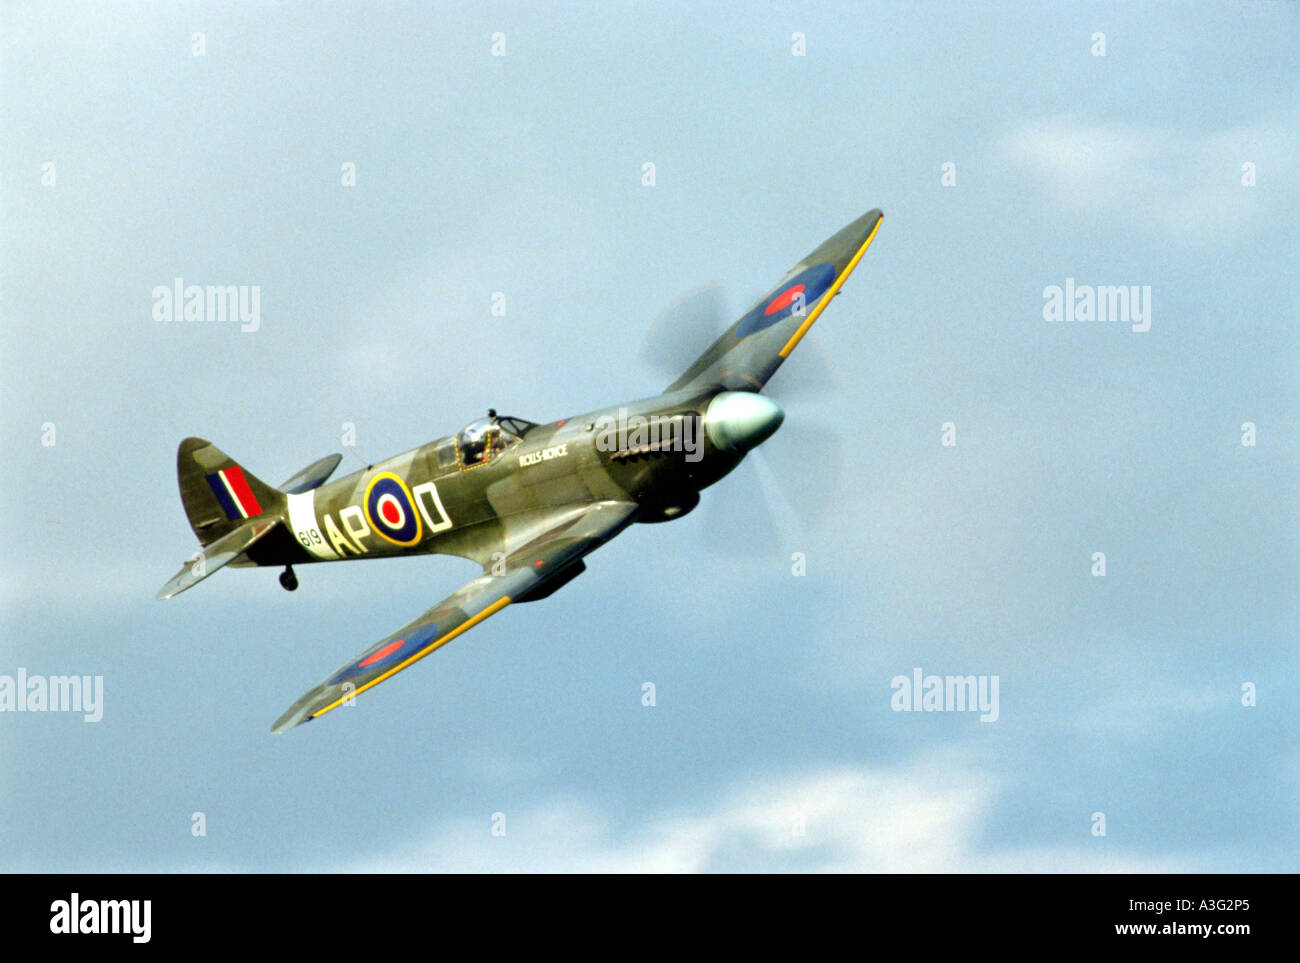 SPITFIRE MKVb - British WW2 aircraft - Stock Image